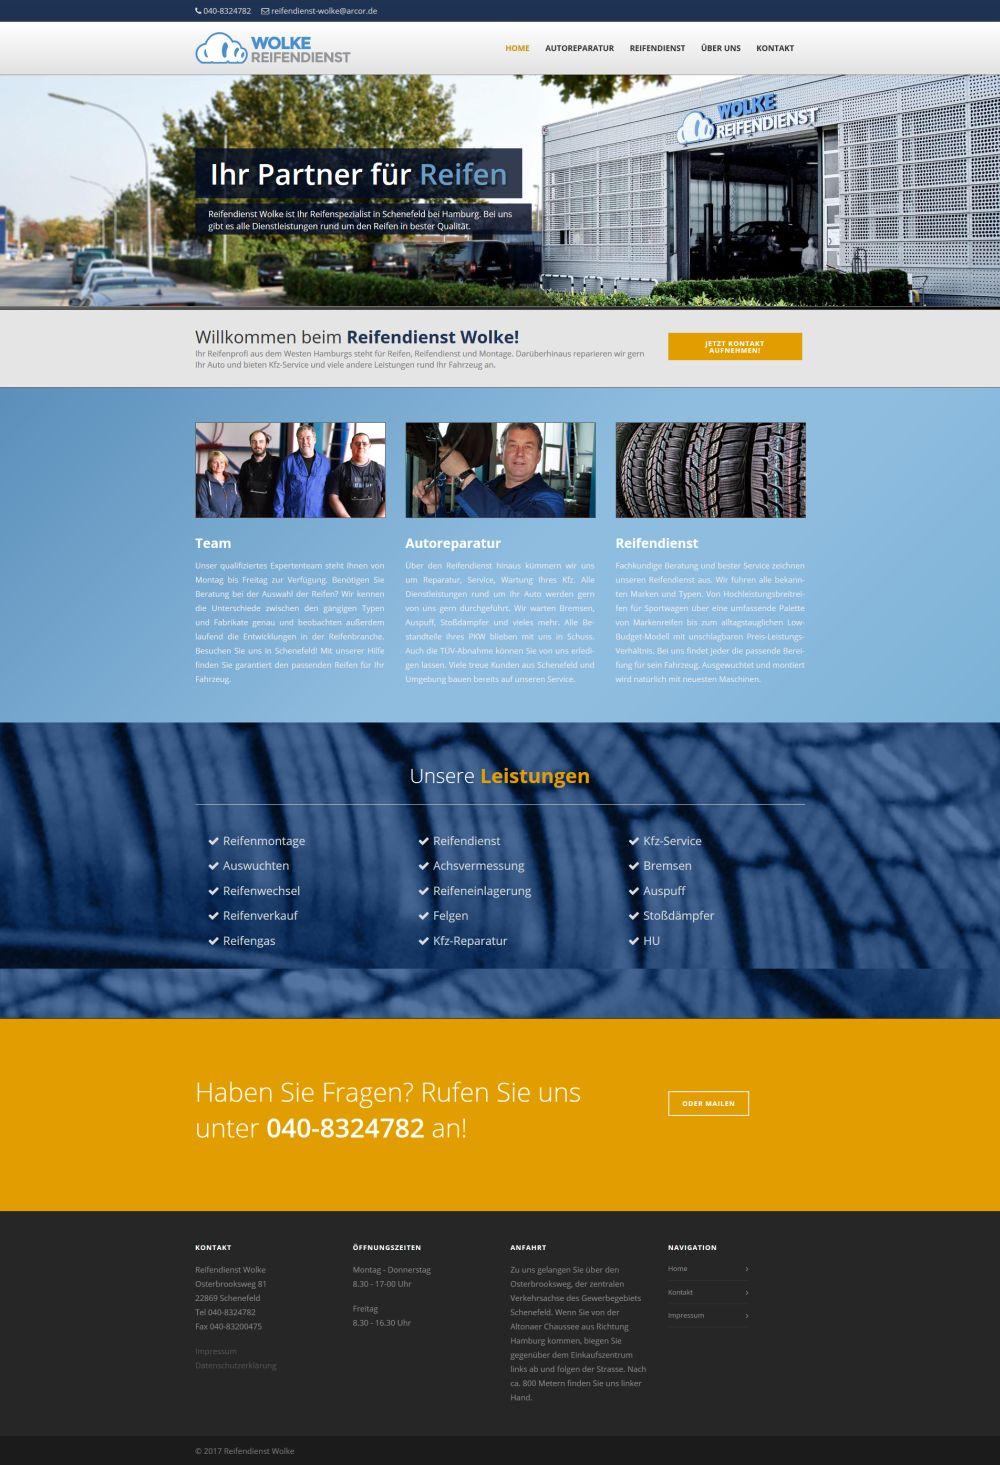 Website Designen Len | 100 Looks Webdesign Reifendienst Wolke